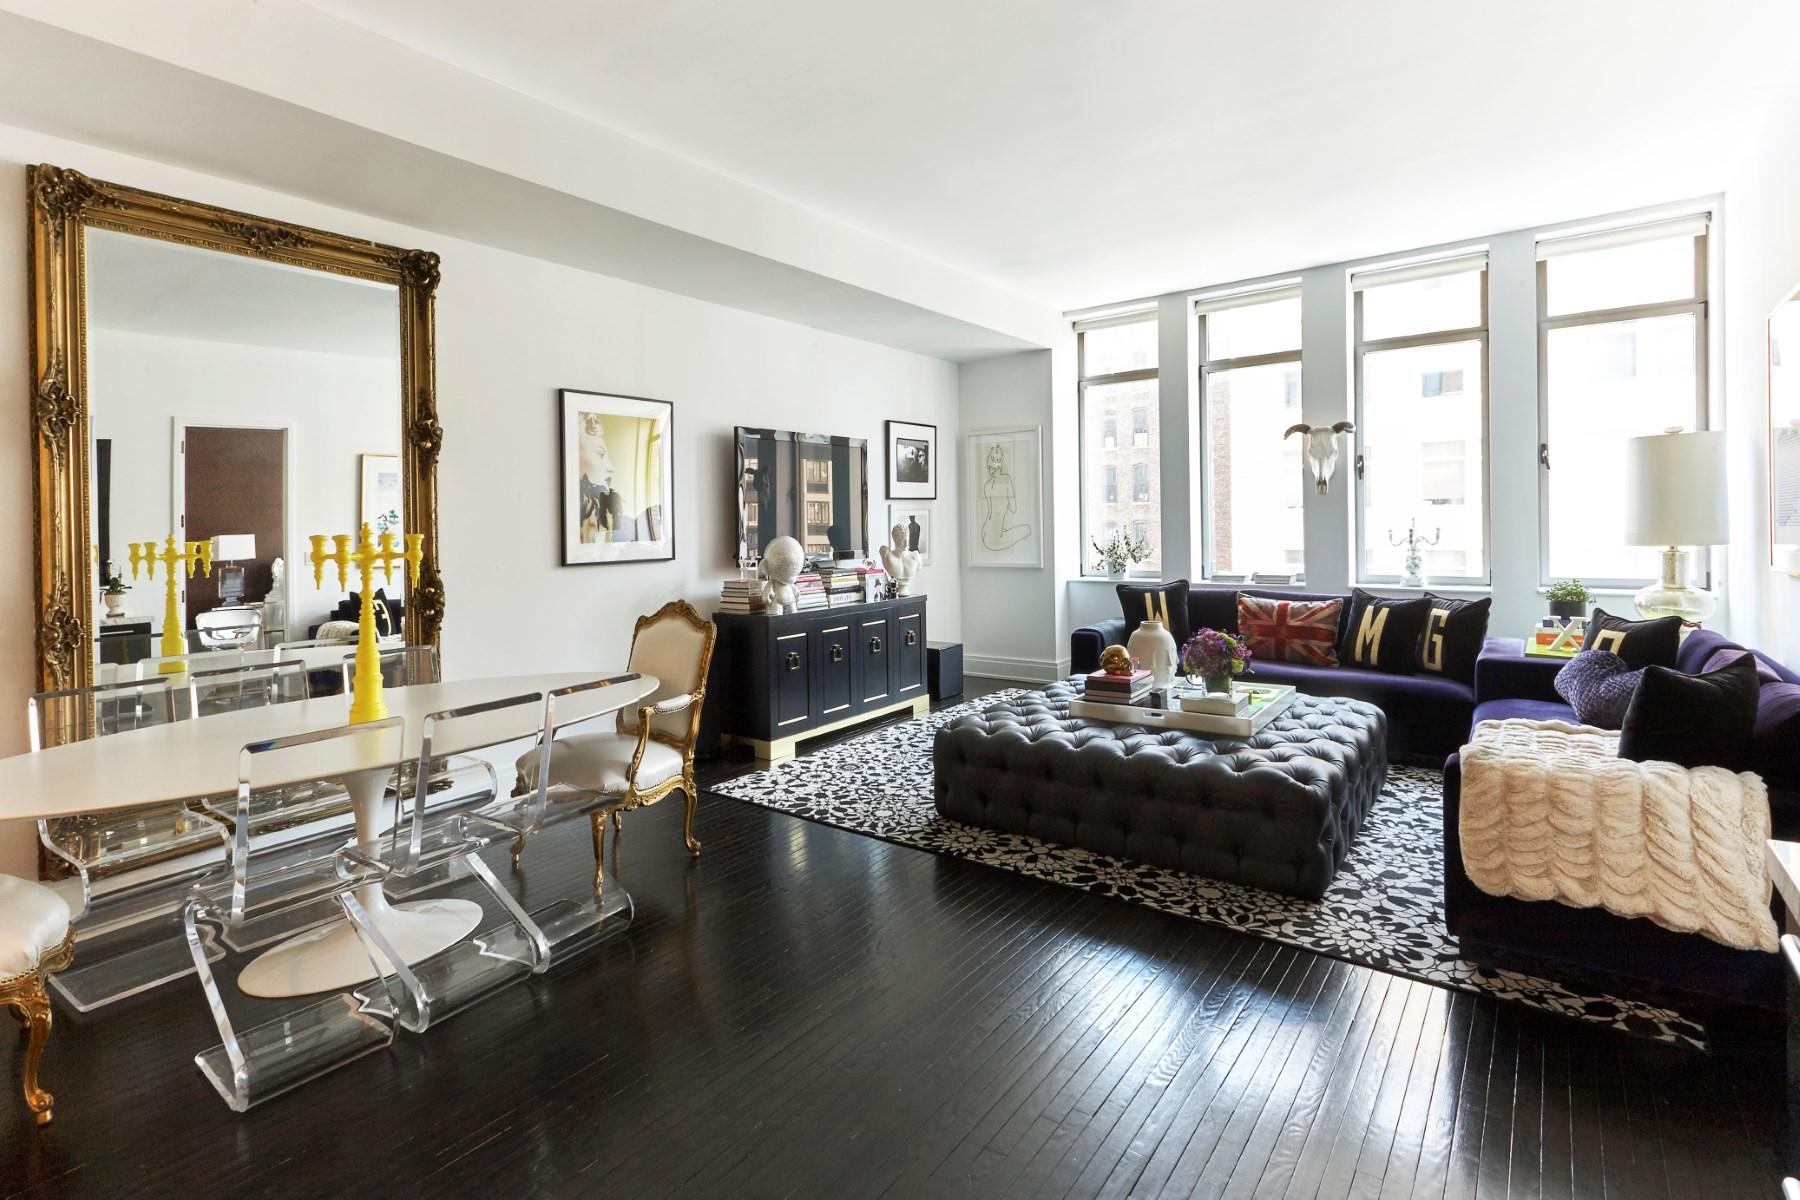 sales property at 252 Seventh Avenue, Apt 9O